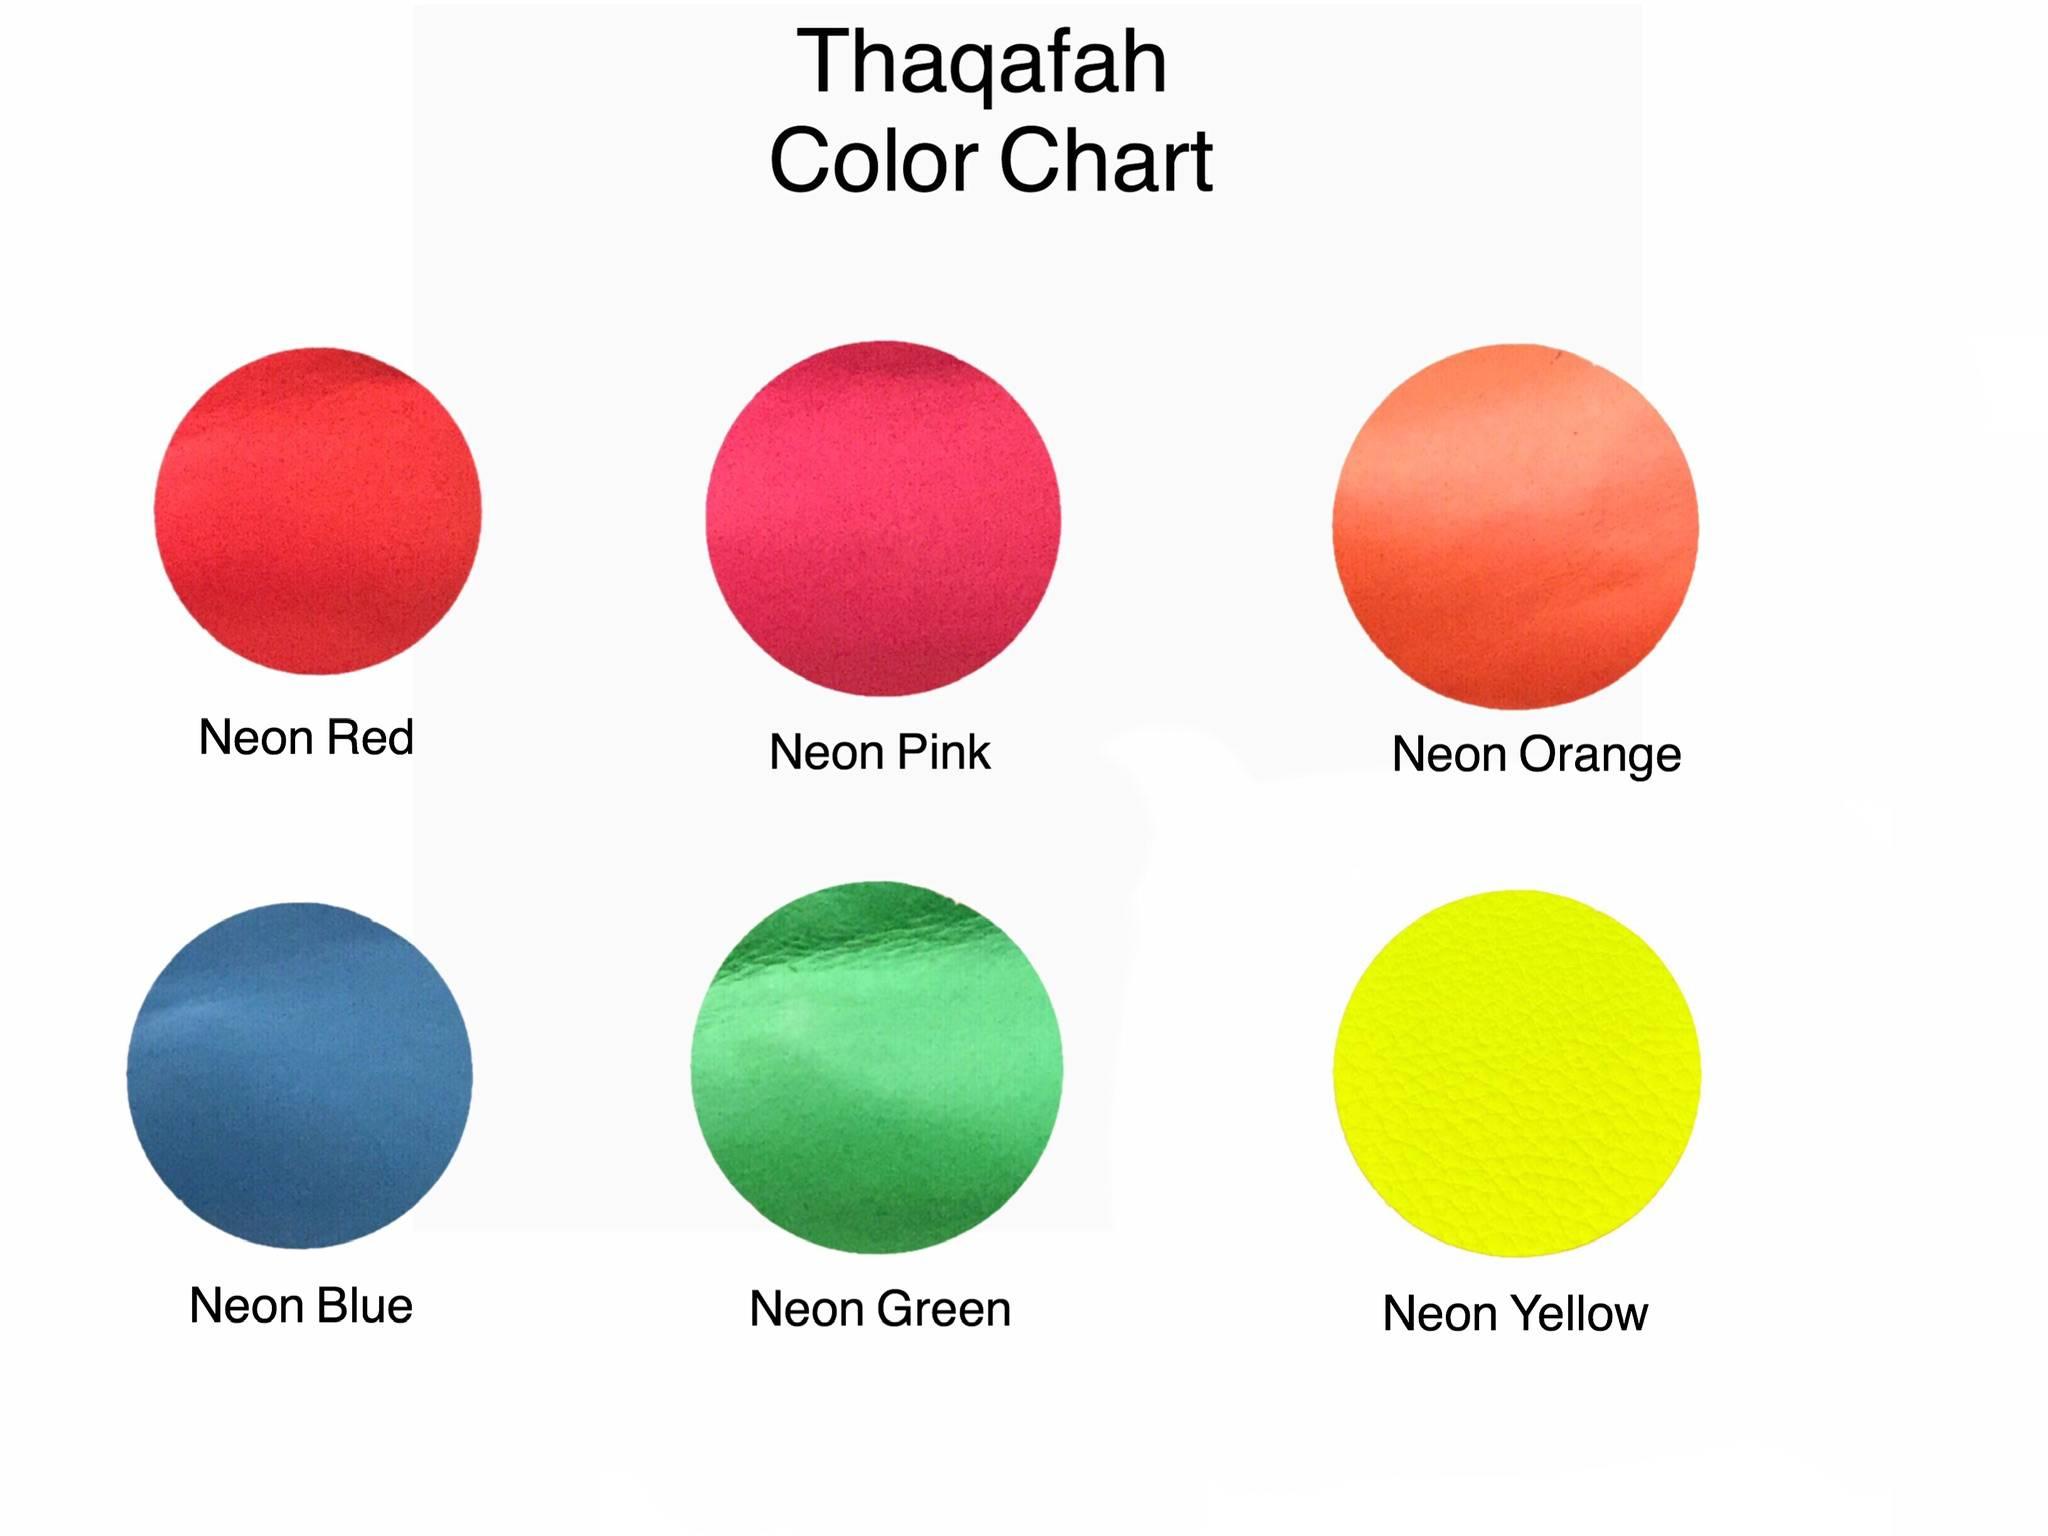 Thaqafah color chart